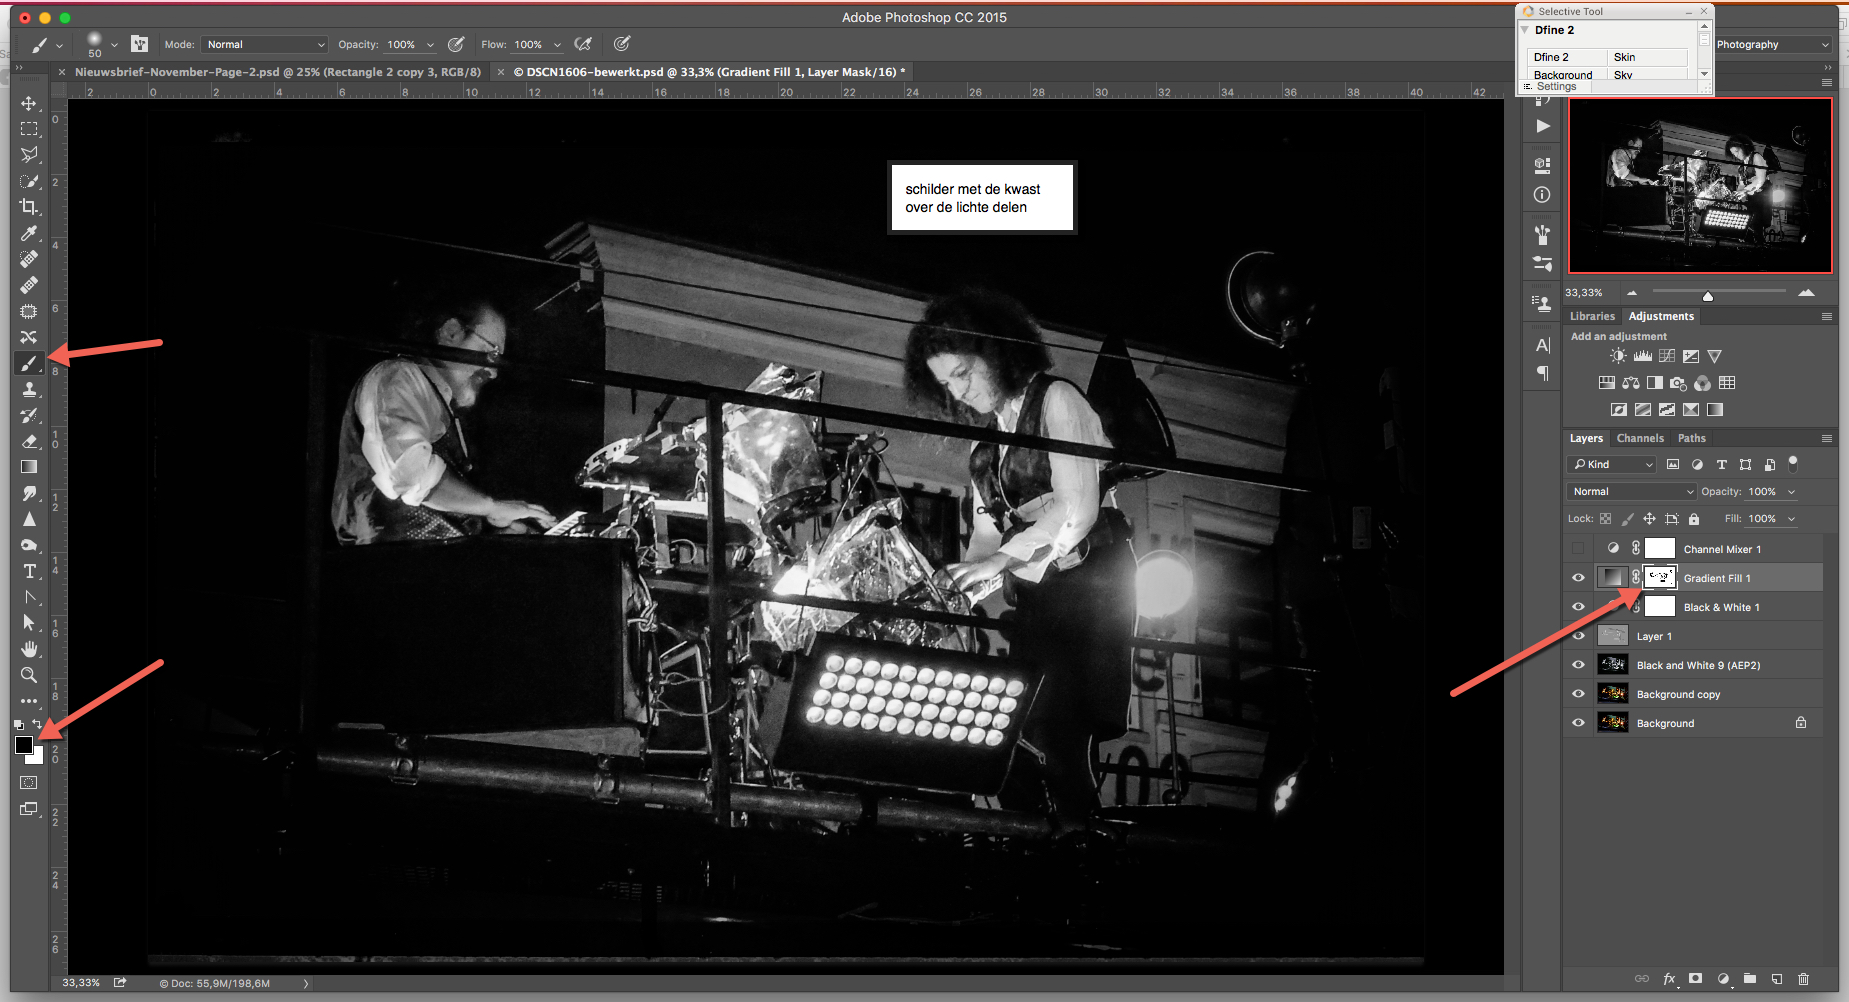 Dramatic_Black_White-Photoshop-15.jpg